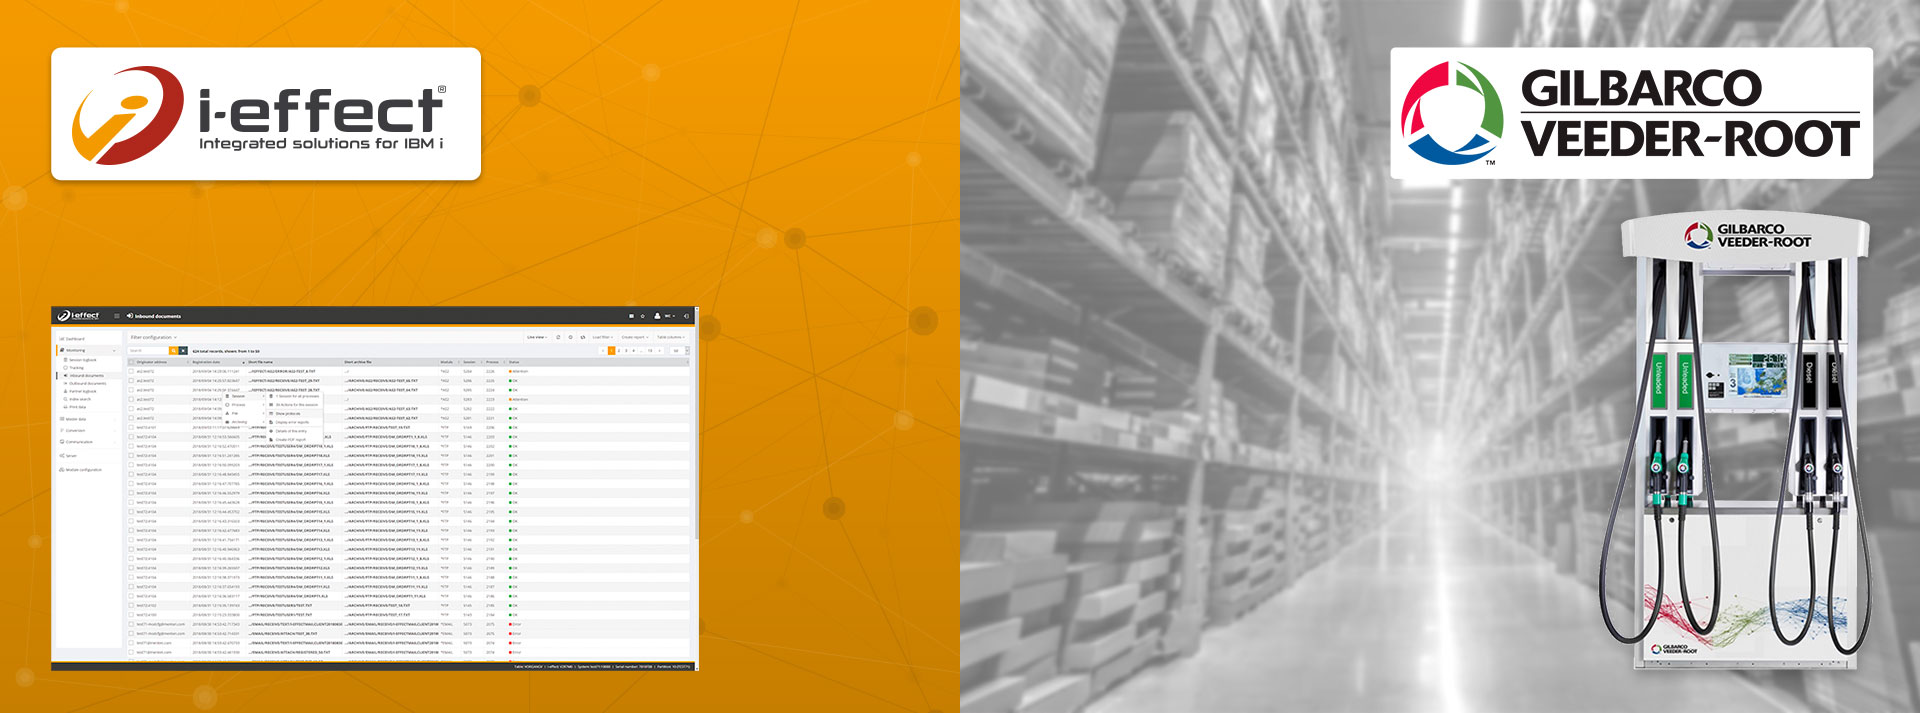 Gilbarco EDI Software Kommunikation ohne Tempolimit